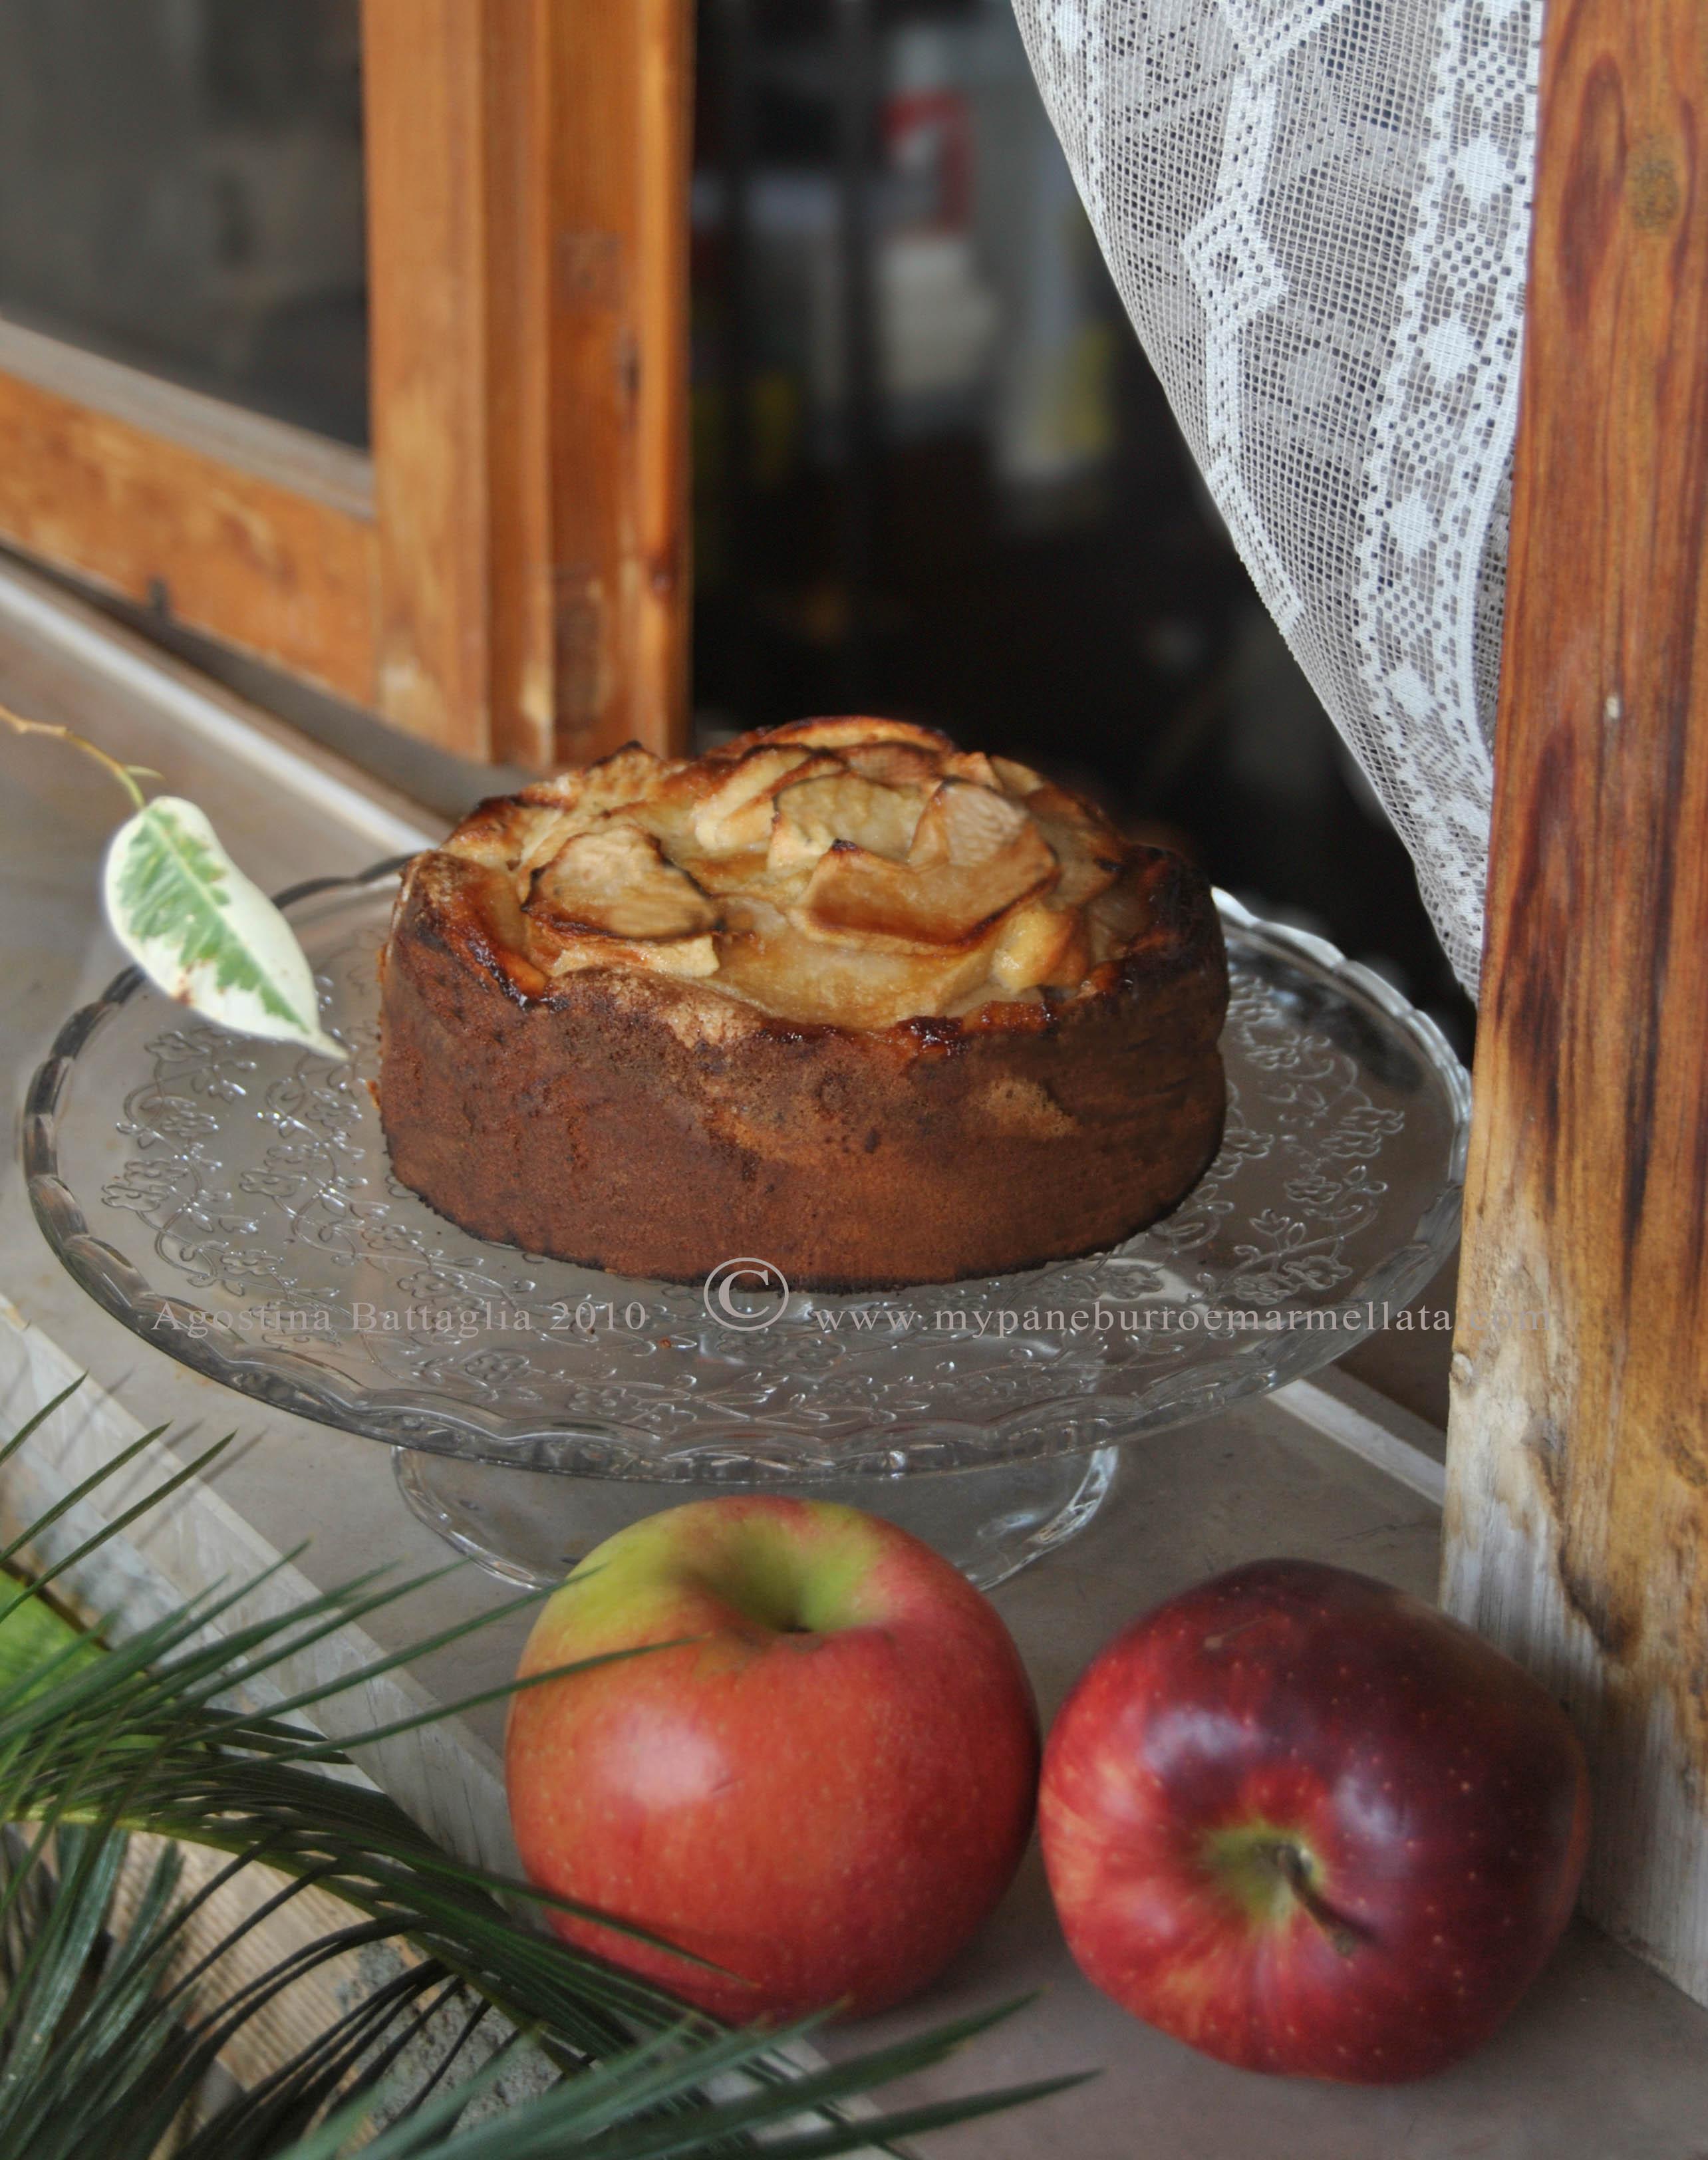 La Torta di mele - dal Manuale di Nonna Papera - Pane 637510fdc8d